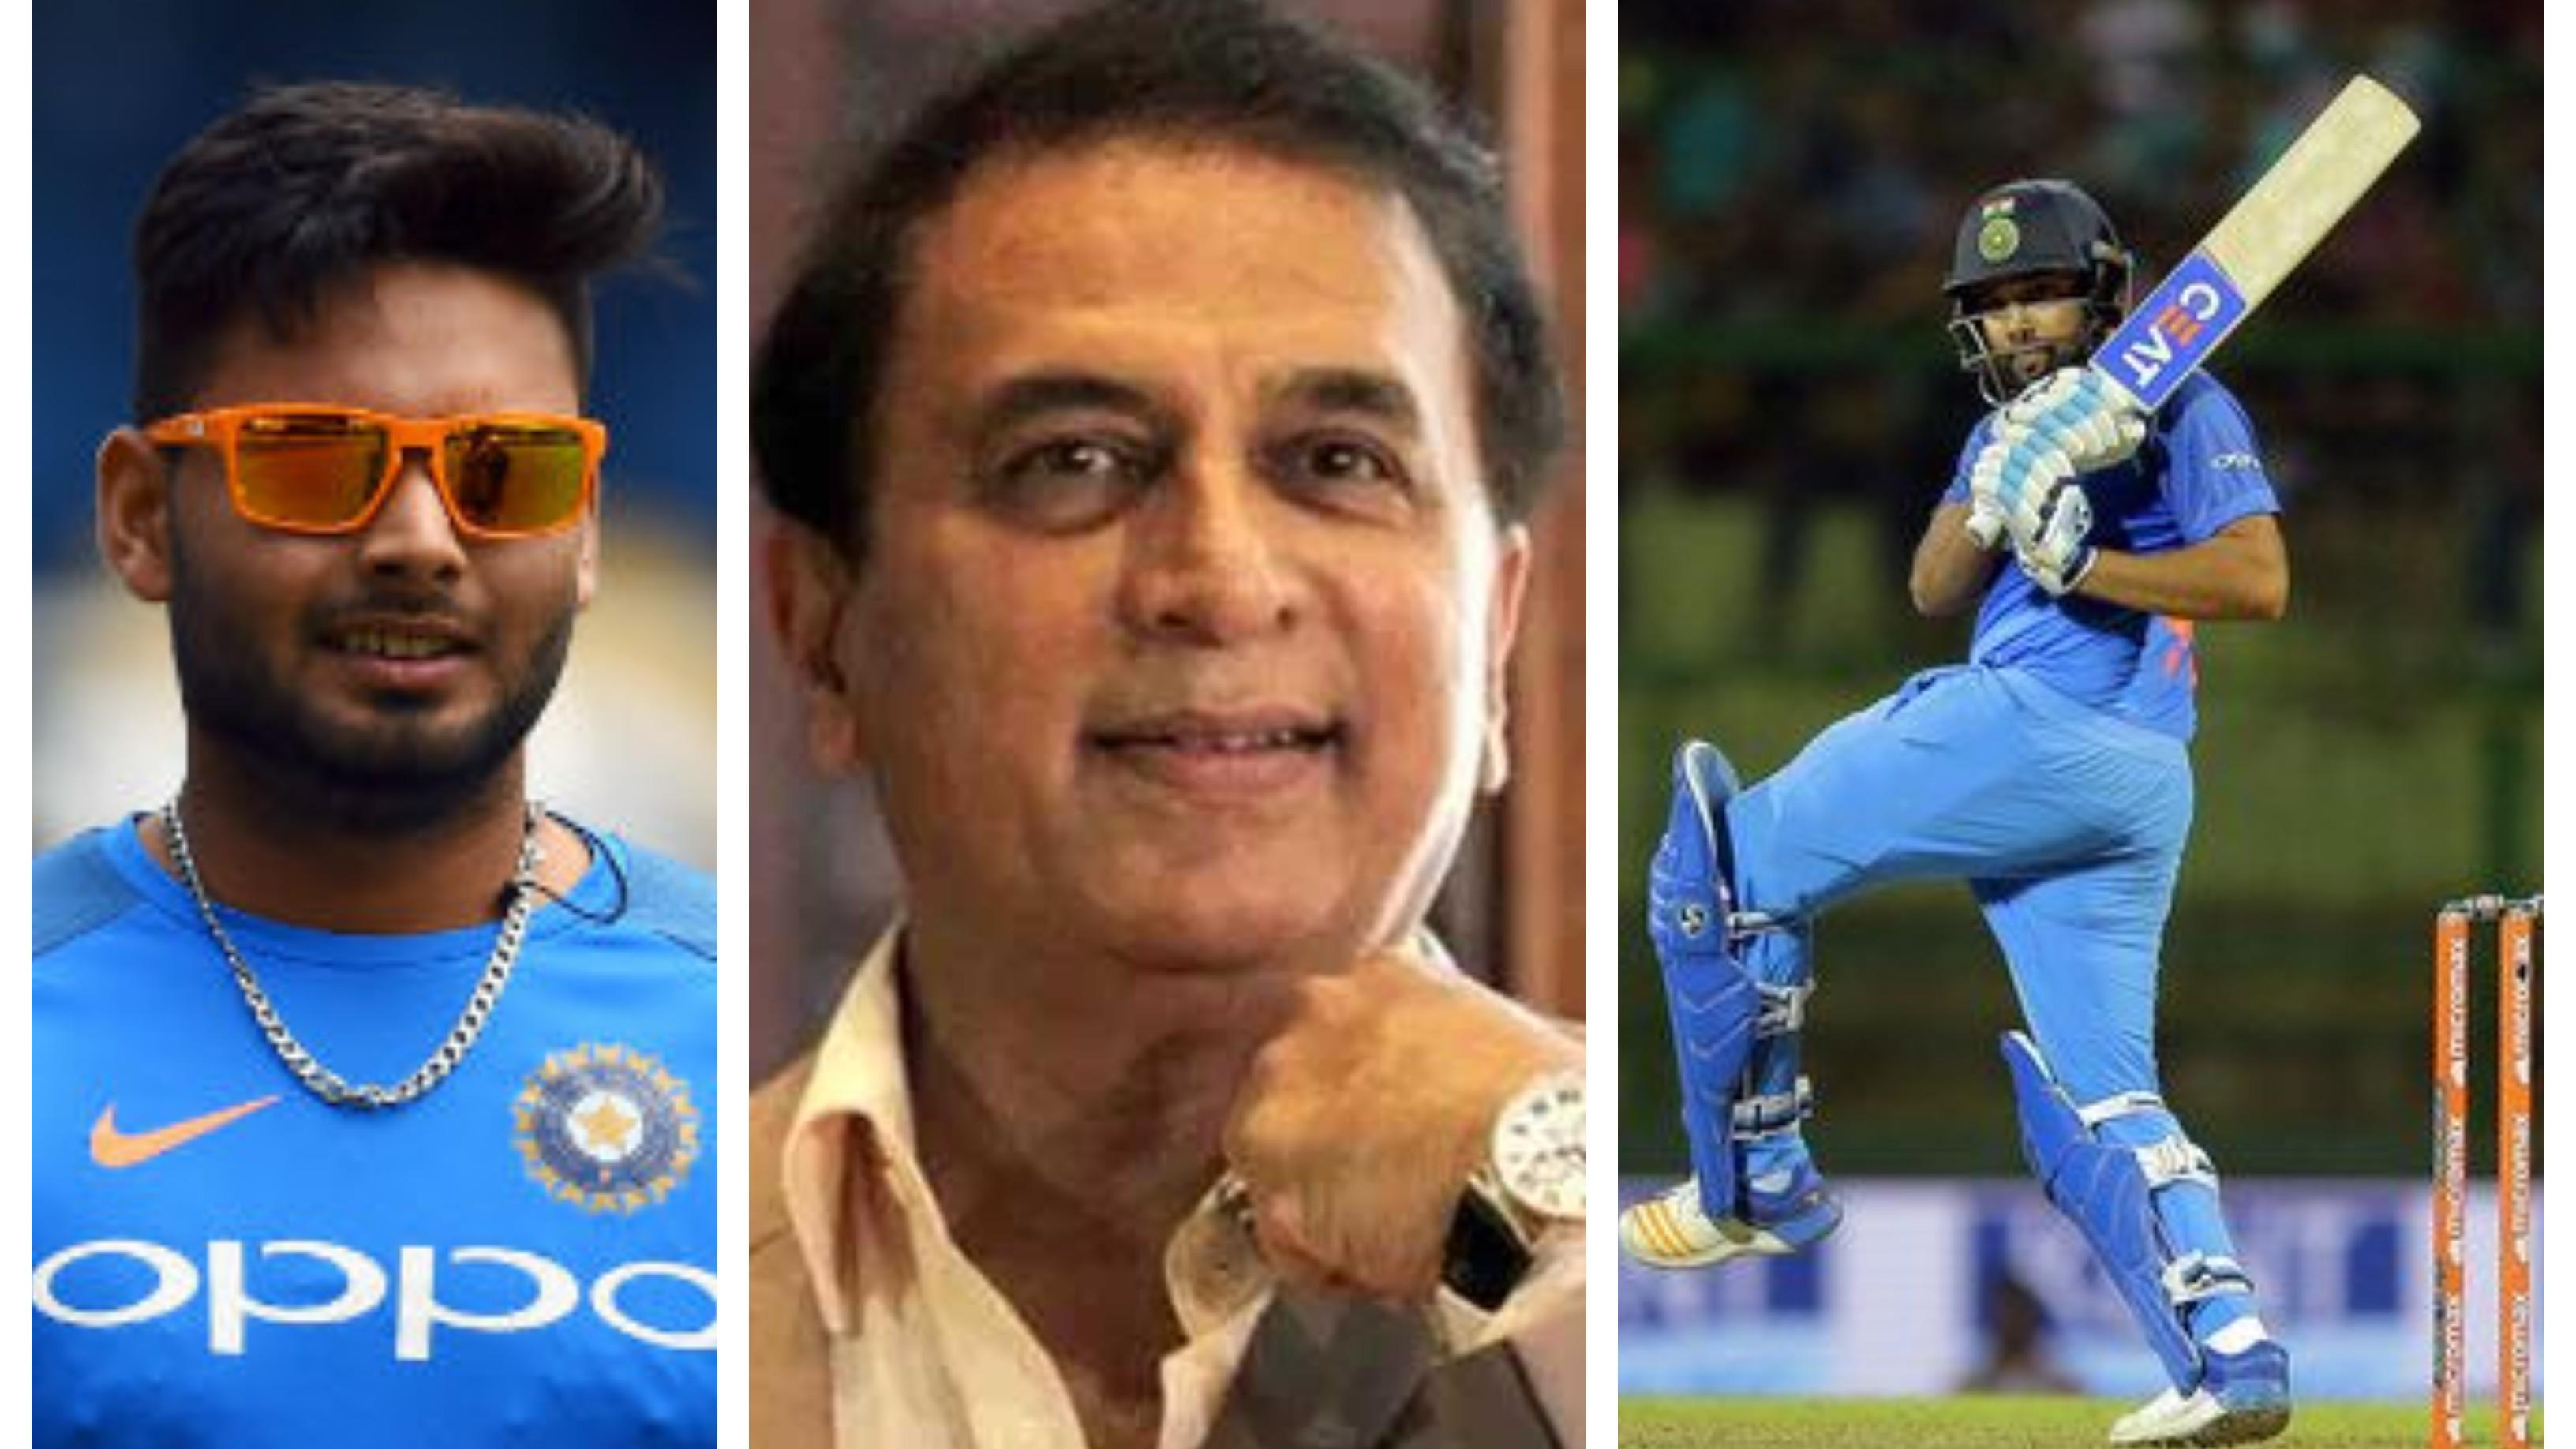 CWC 2019: Sunil Gavaskar backs Warne's idea of Rishabh Pant opening the batting in the 2019 World Cup